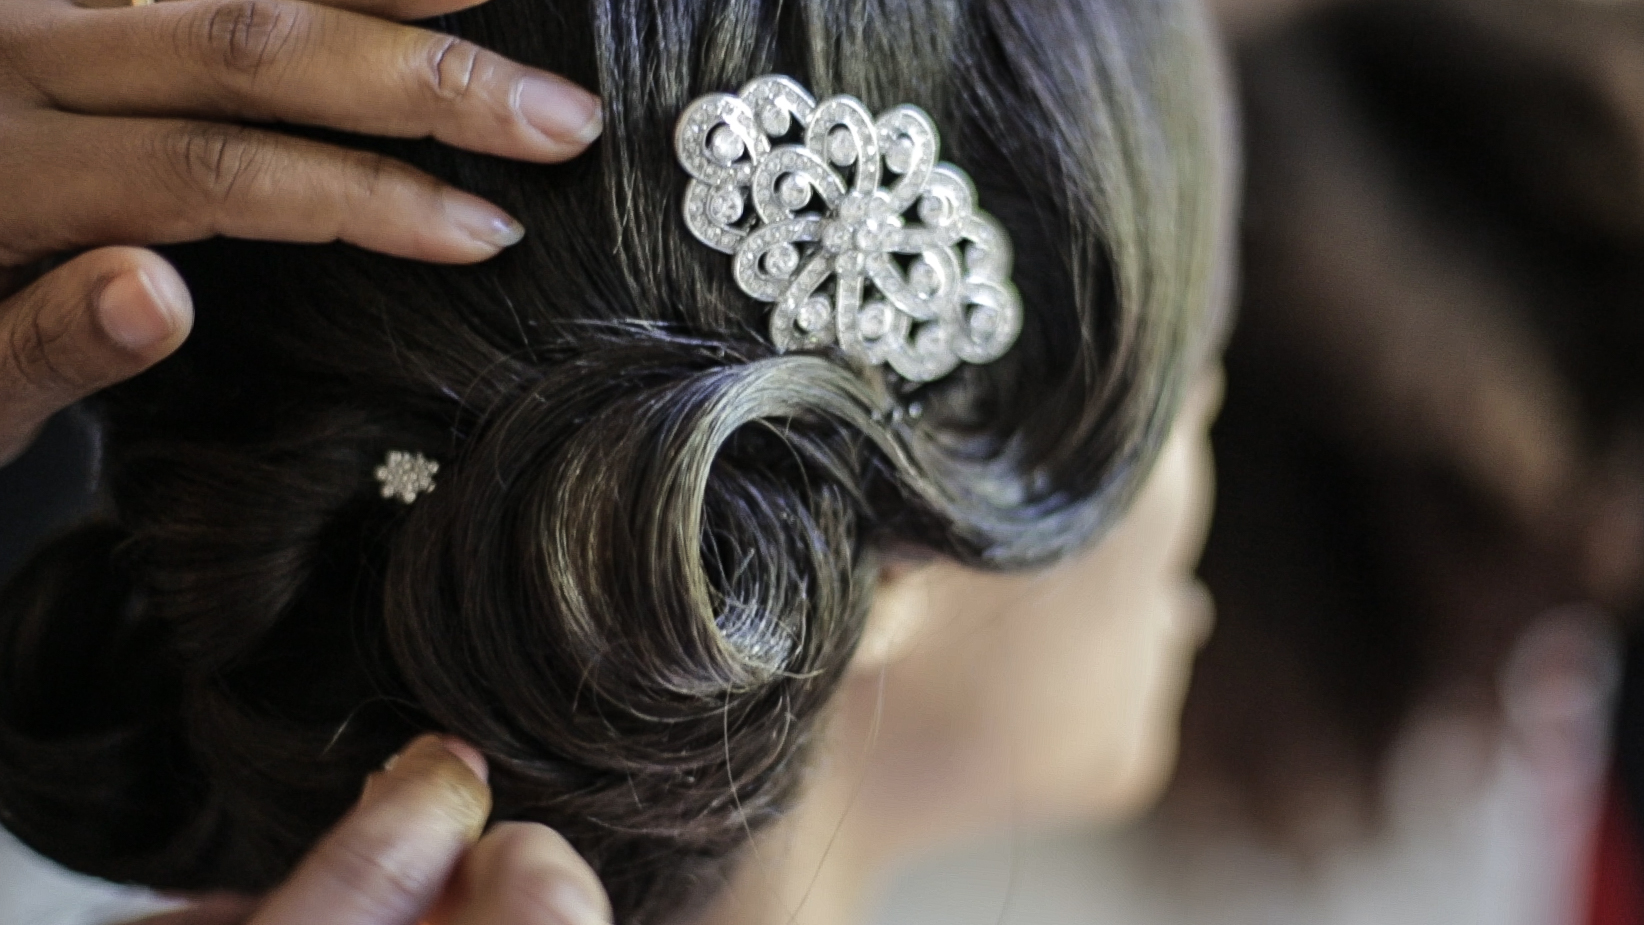 holland-park-bridal-prep-hair-2-london-uk-destination-wedding-photography-Adam-Rowley